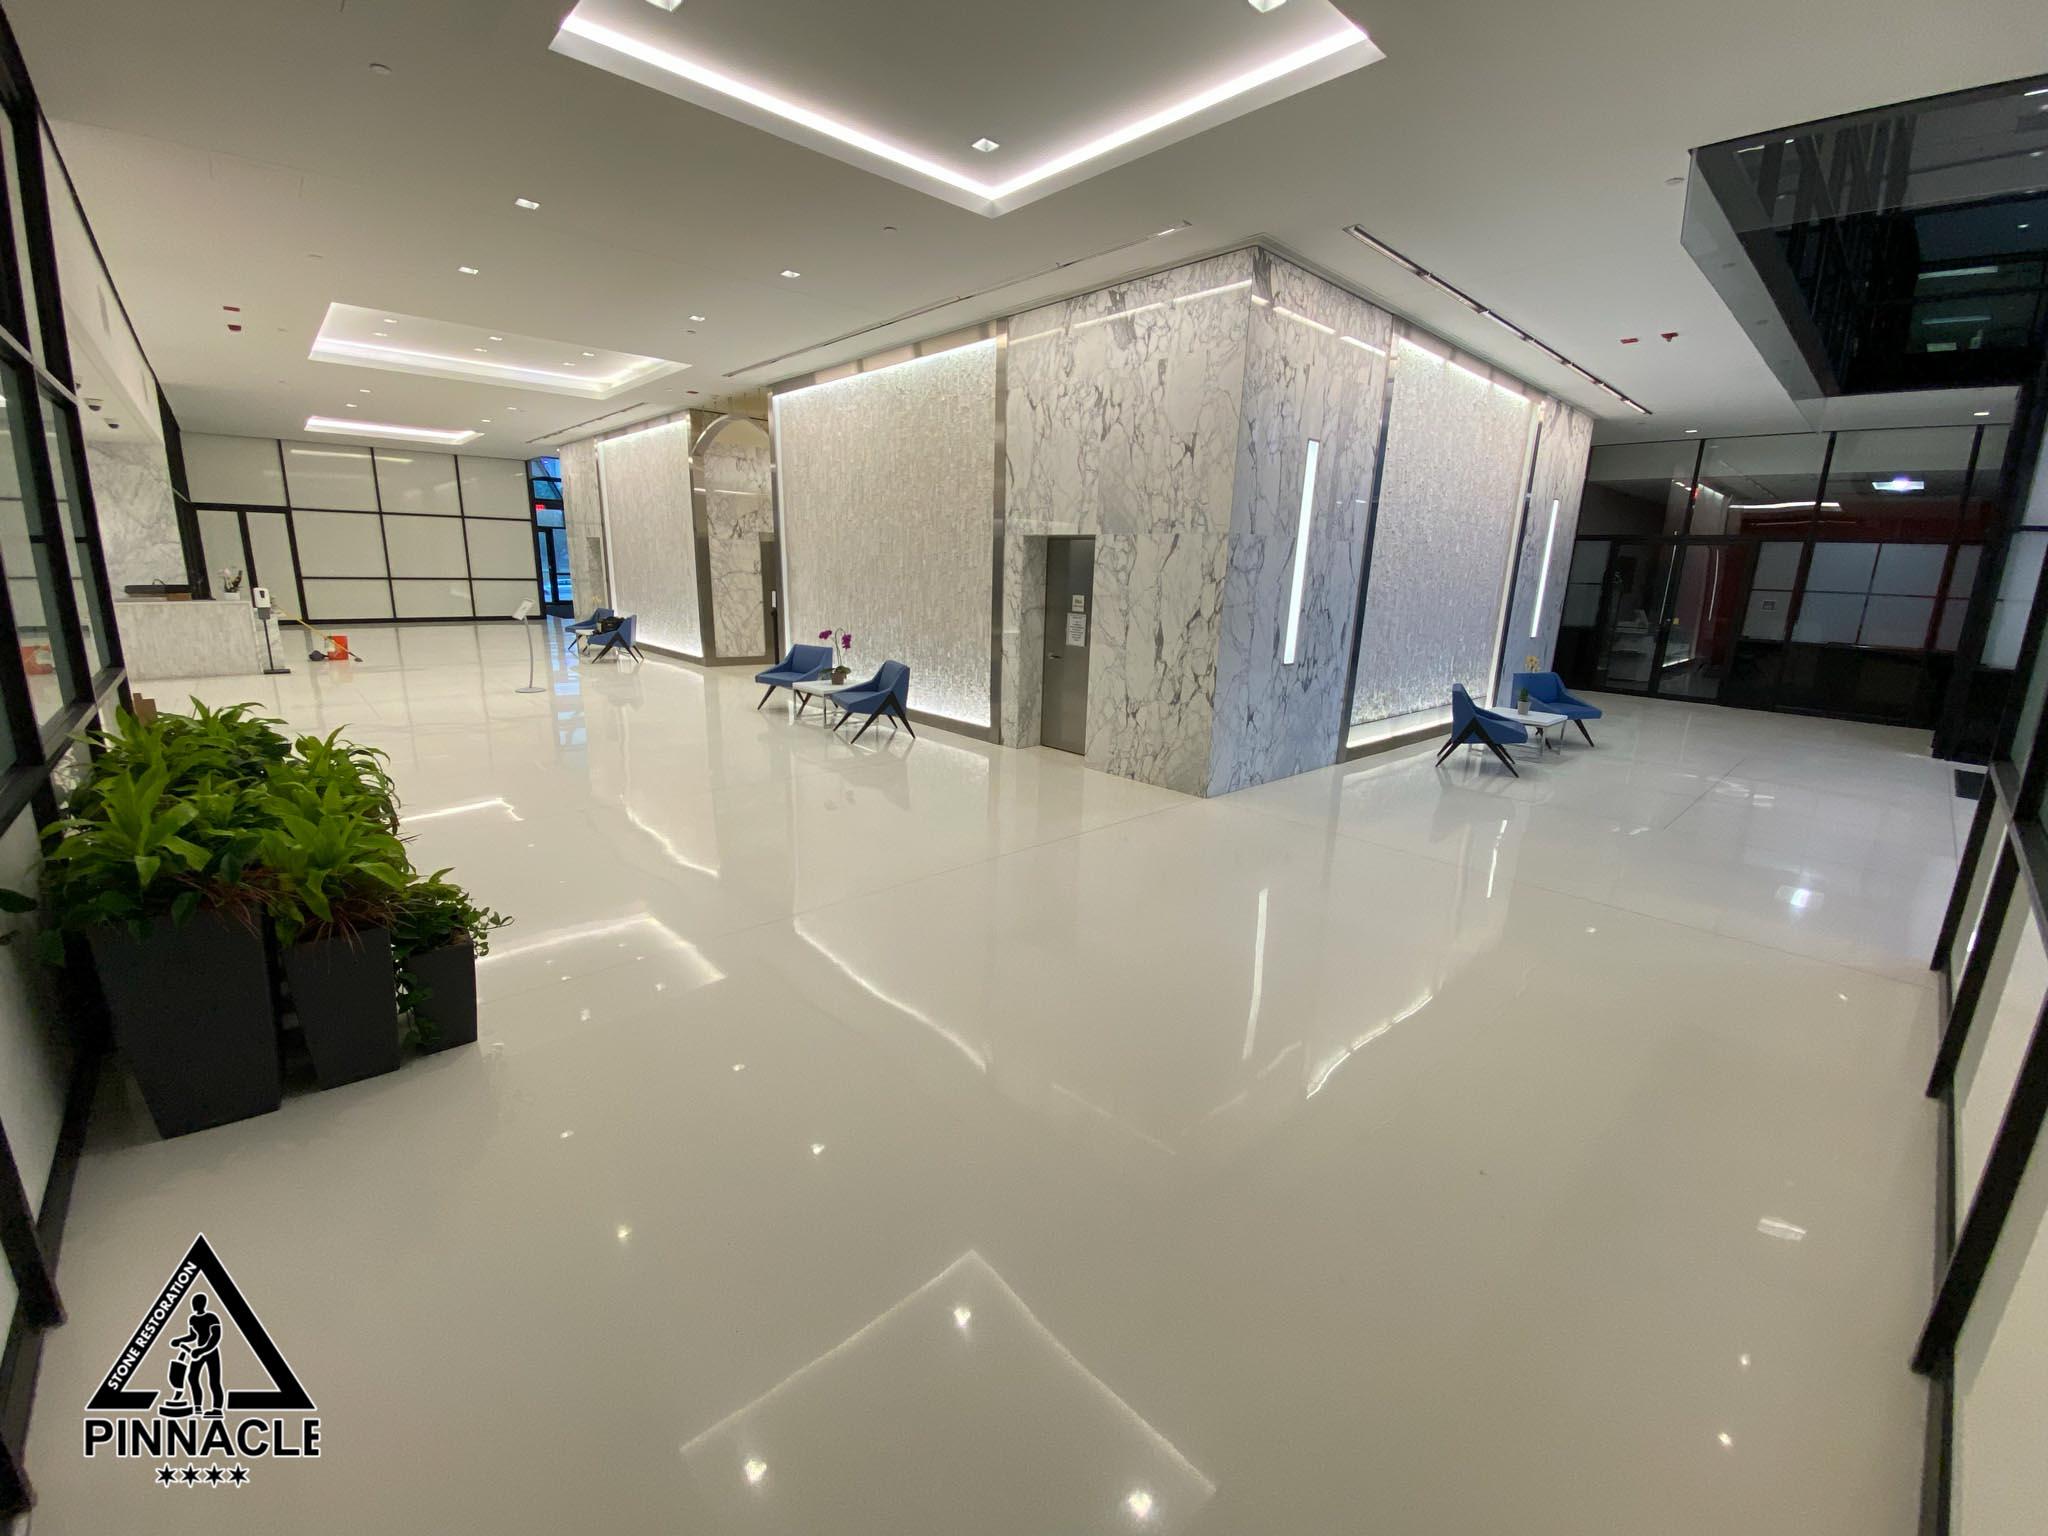 Lobby White Terrazzo Floor Restoration – grinding, grouting, honing, polishing, sealing, burnishing